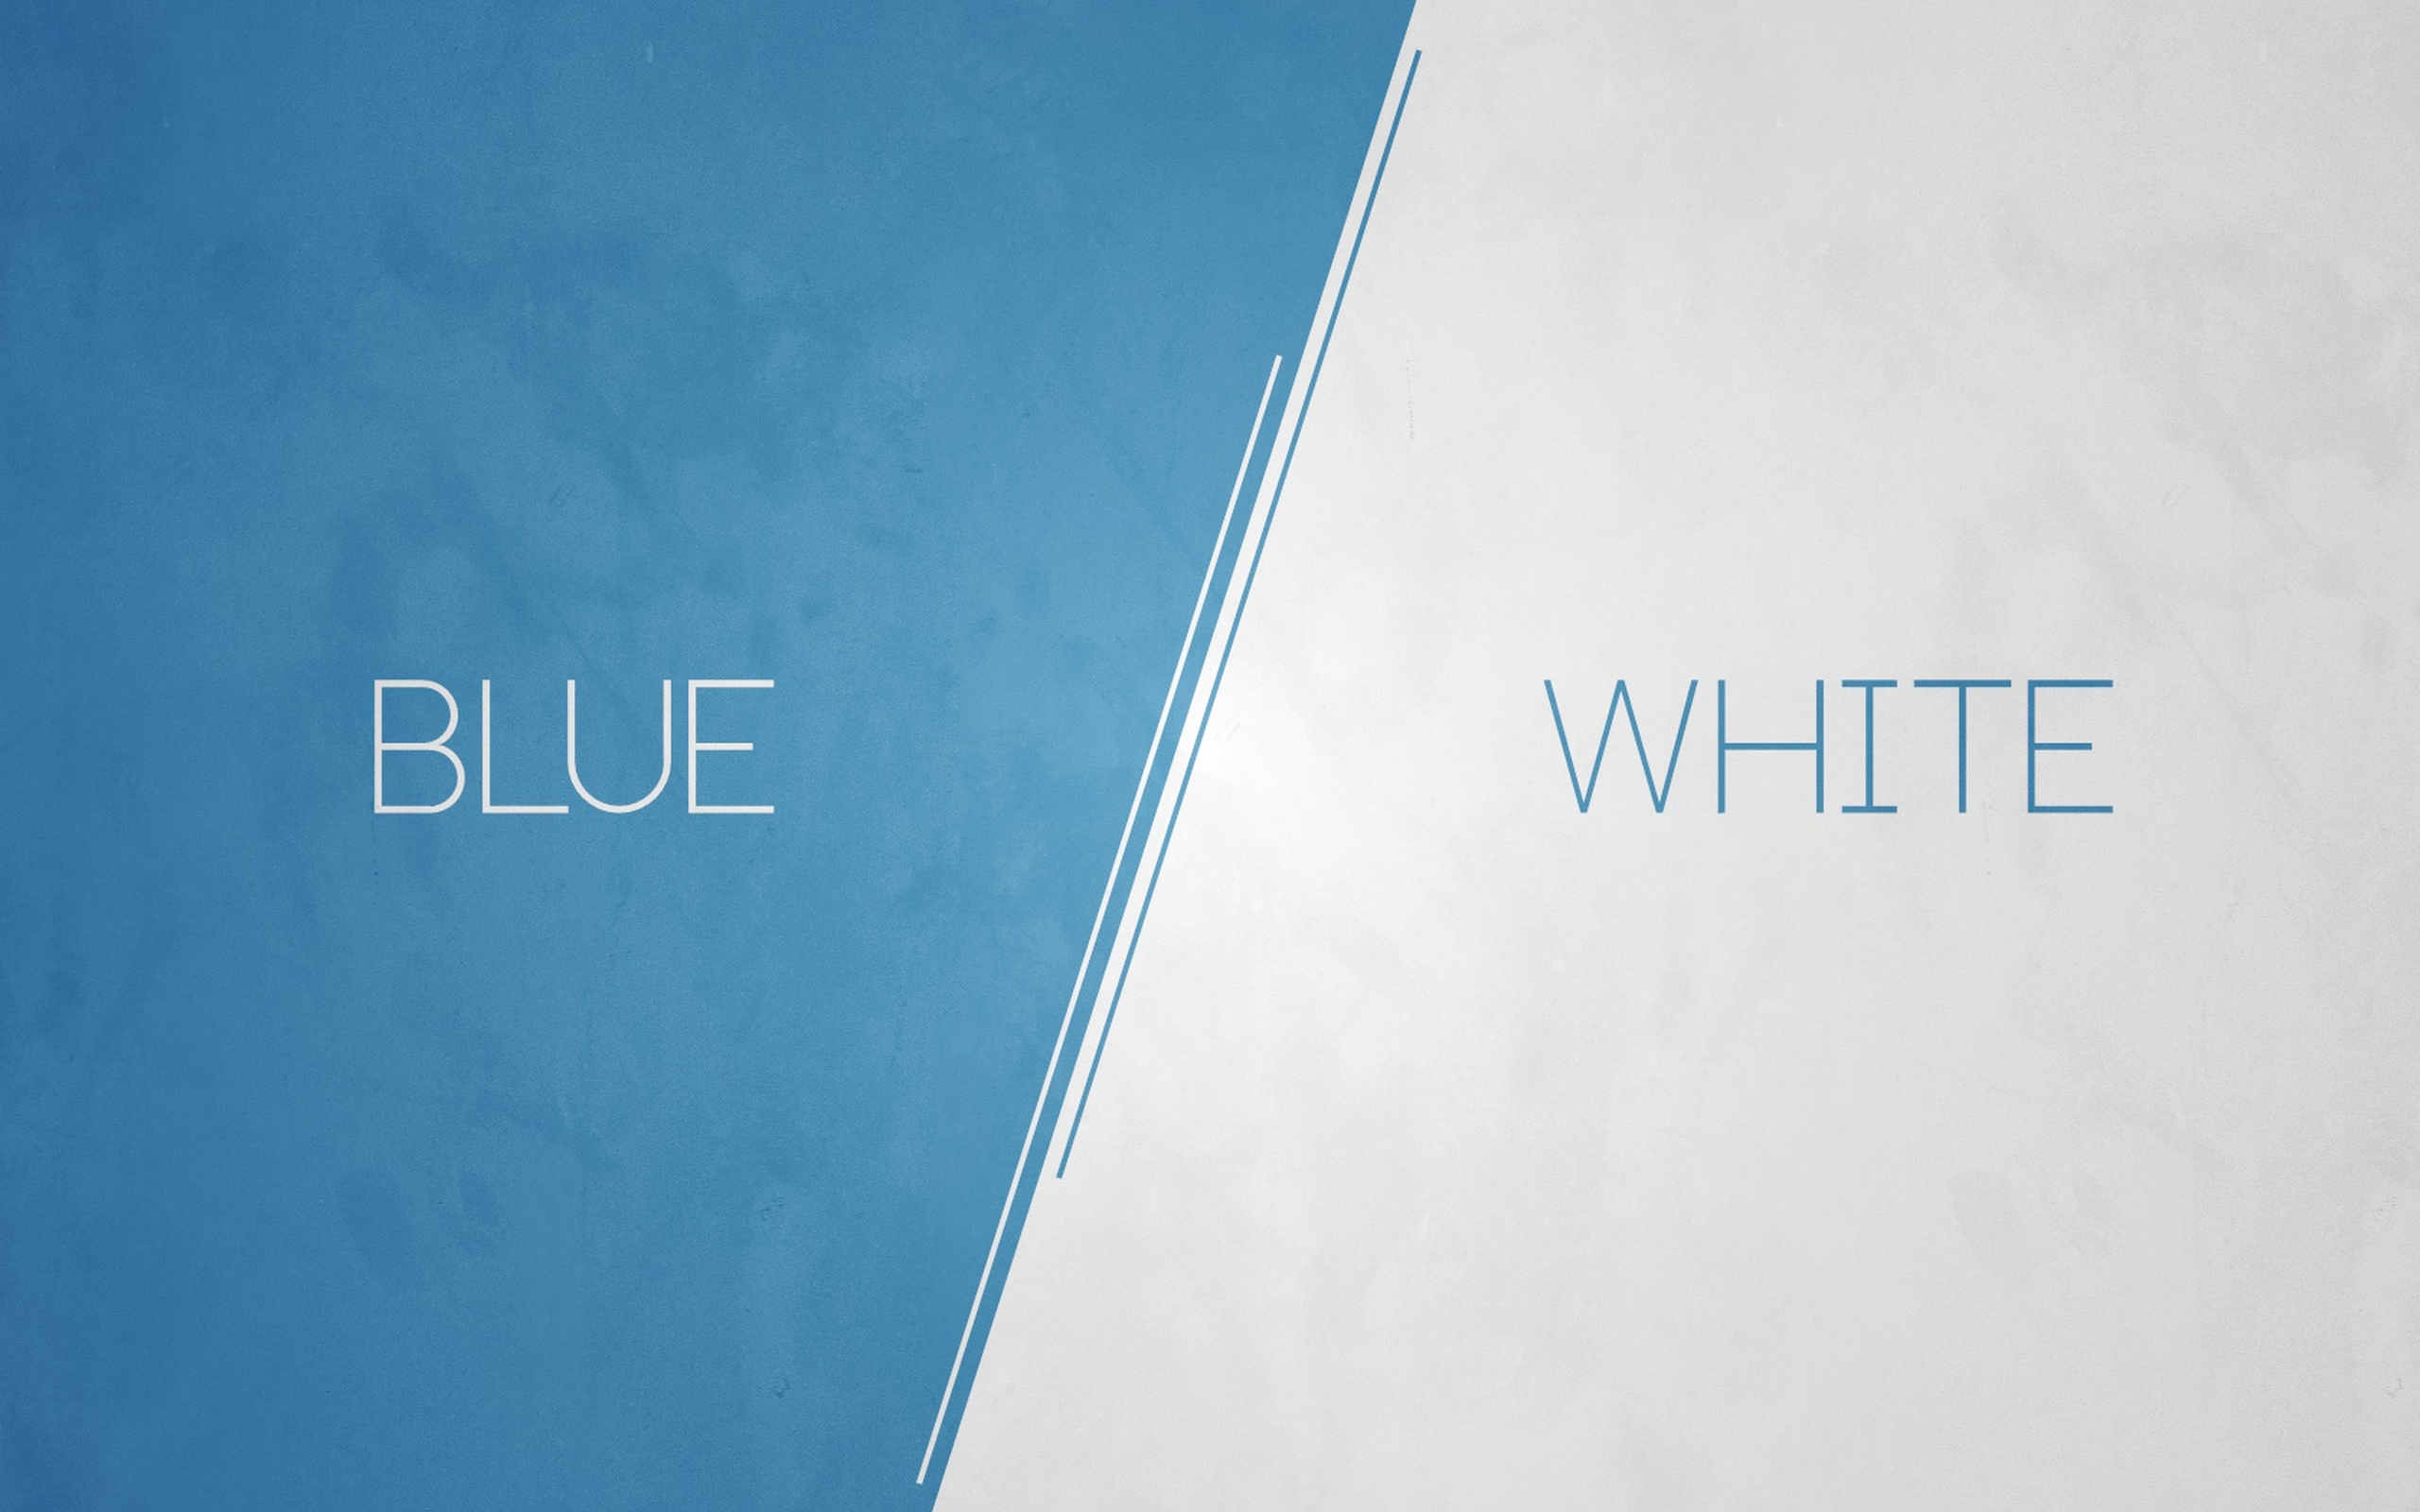 General 2560x1600 abstract modern minimalism blue white digital art